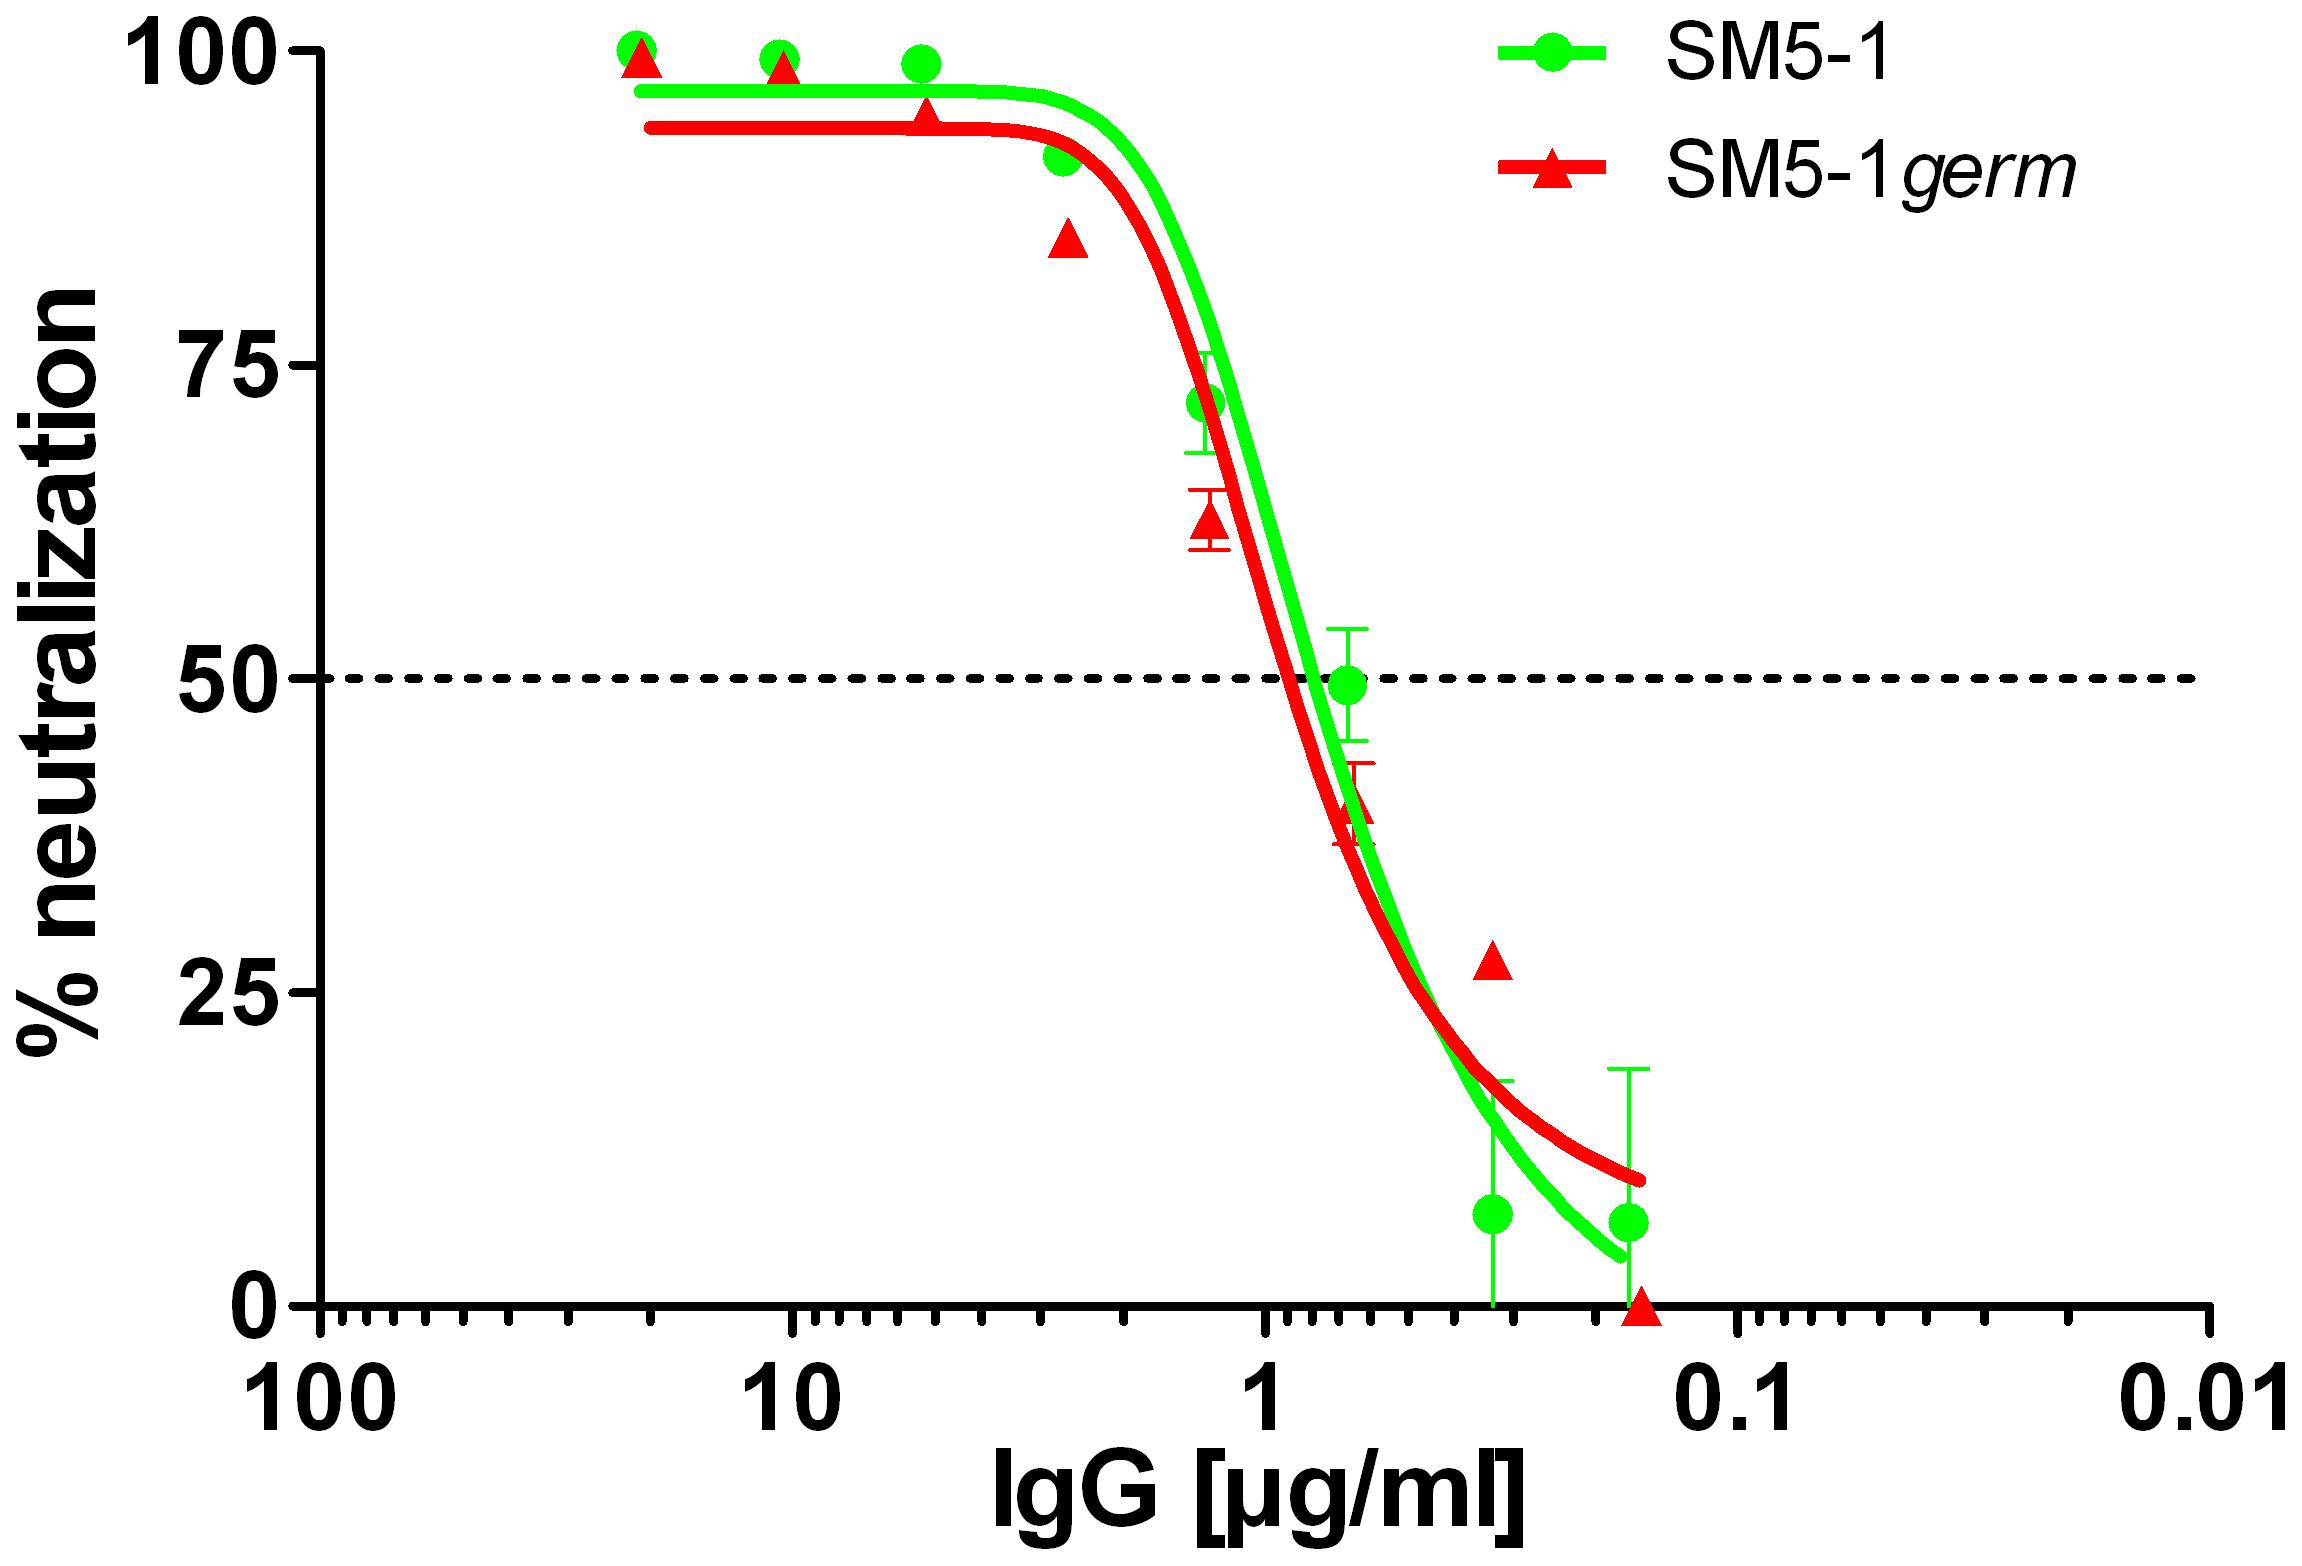 Neutralization capacity of SM5-1 and of partially germline-reverted SM5-1<i>germ</i>.